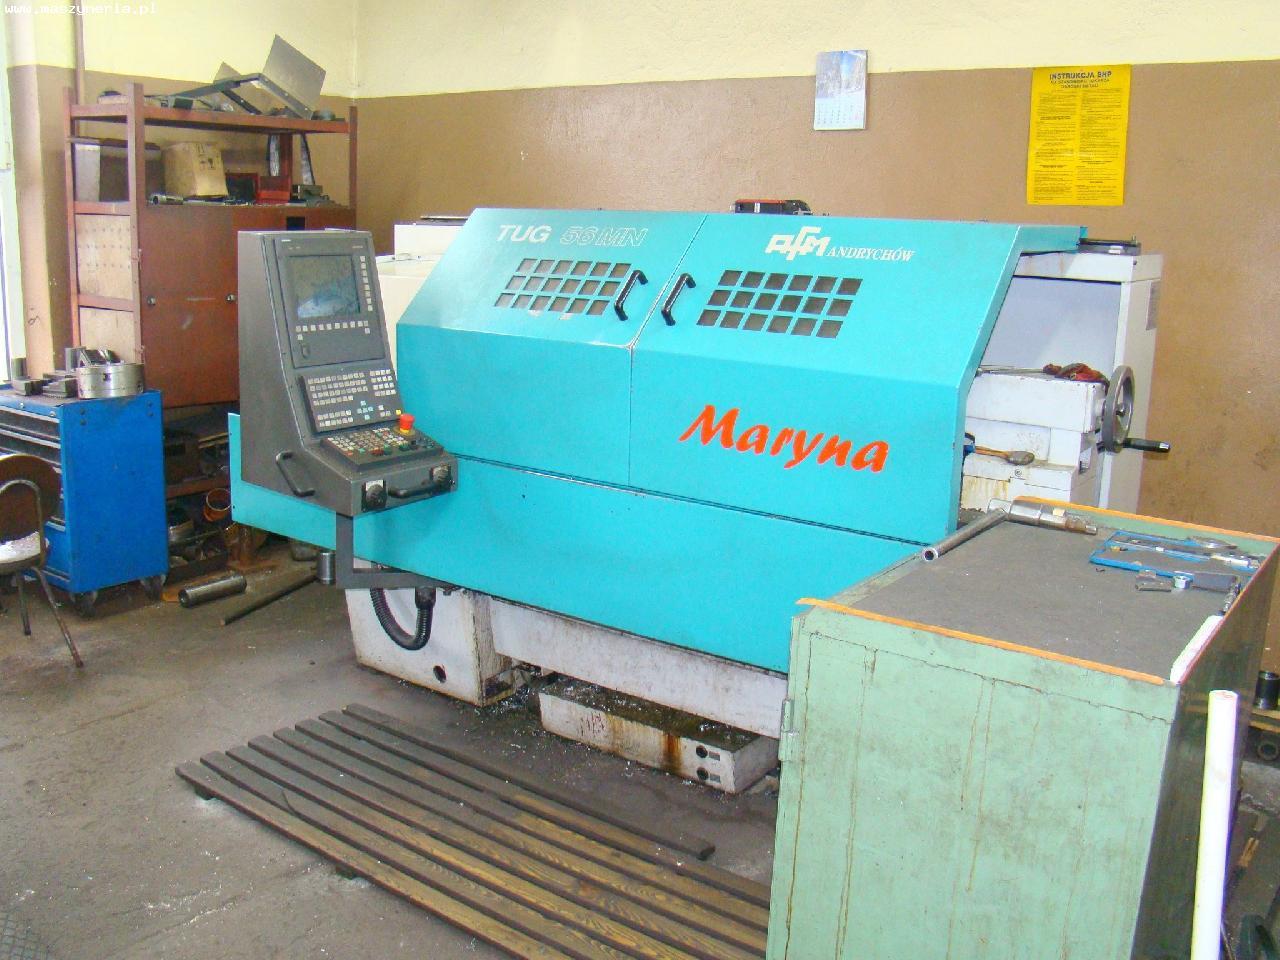 Tokarka CNC MARYNA TUG 56 MN, 2006 rok produkcji